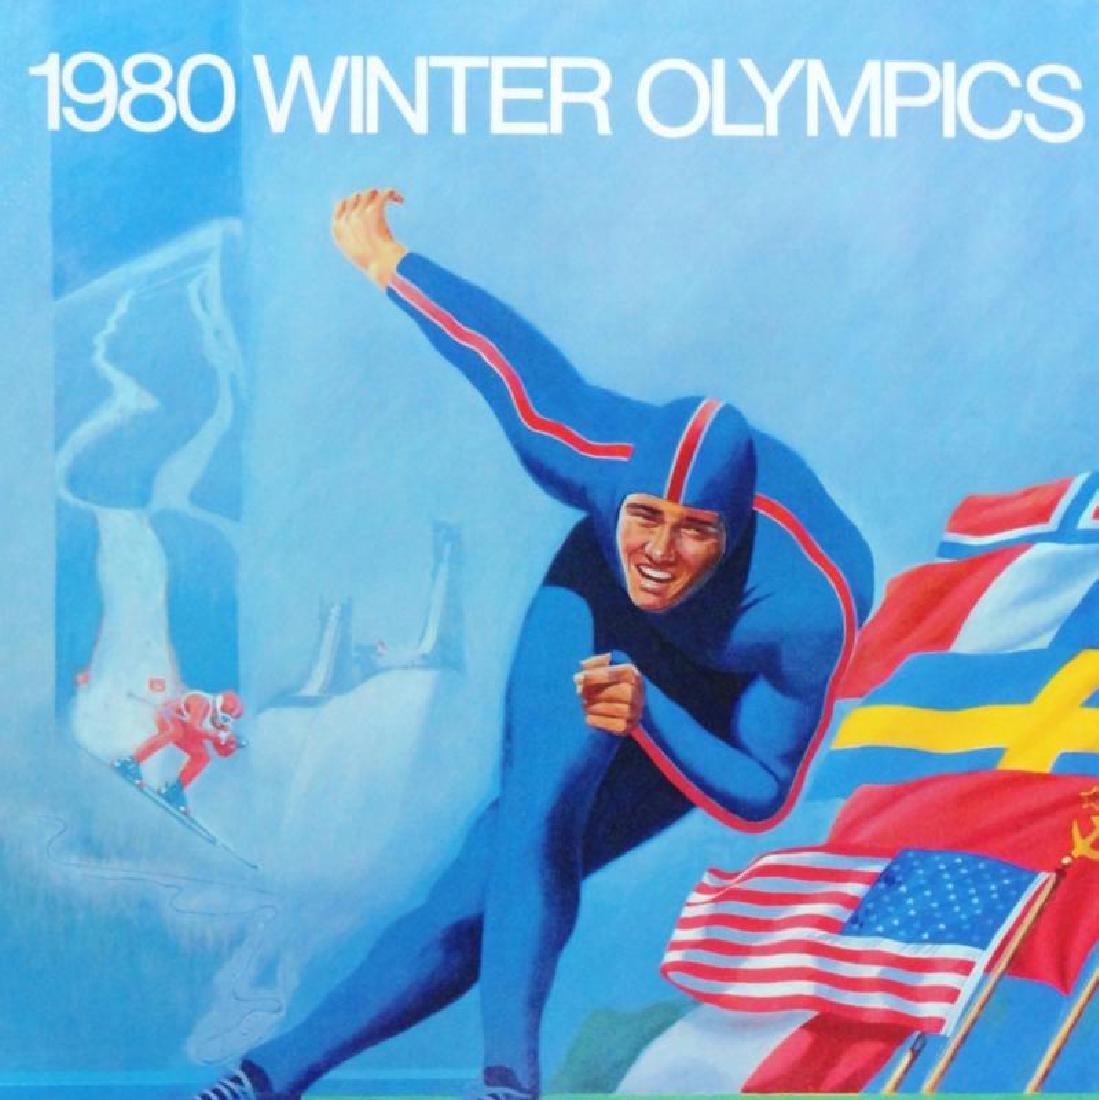 1980 Winter Olympics Print Hand Signed Donald Moss - 2